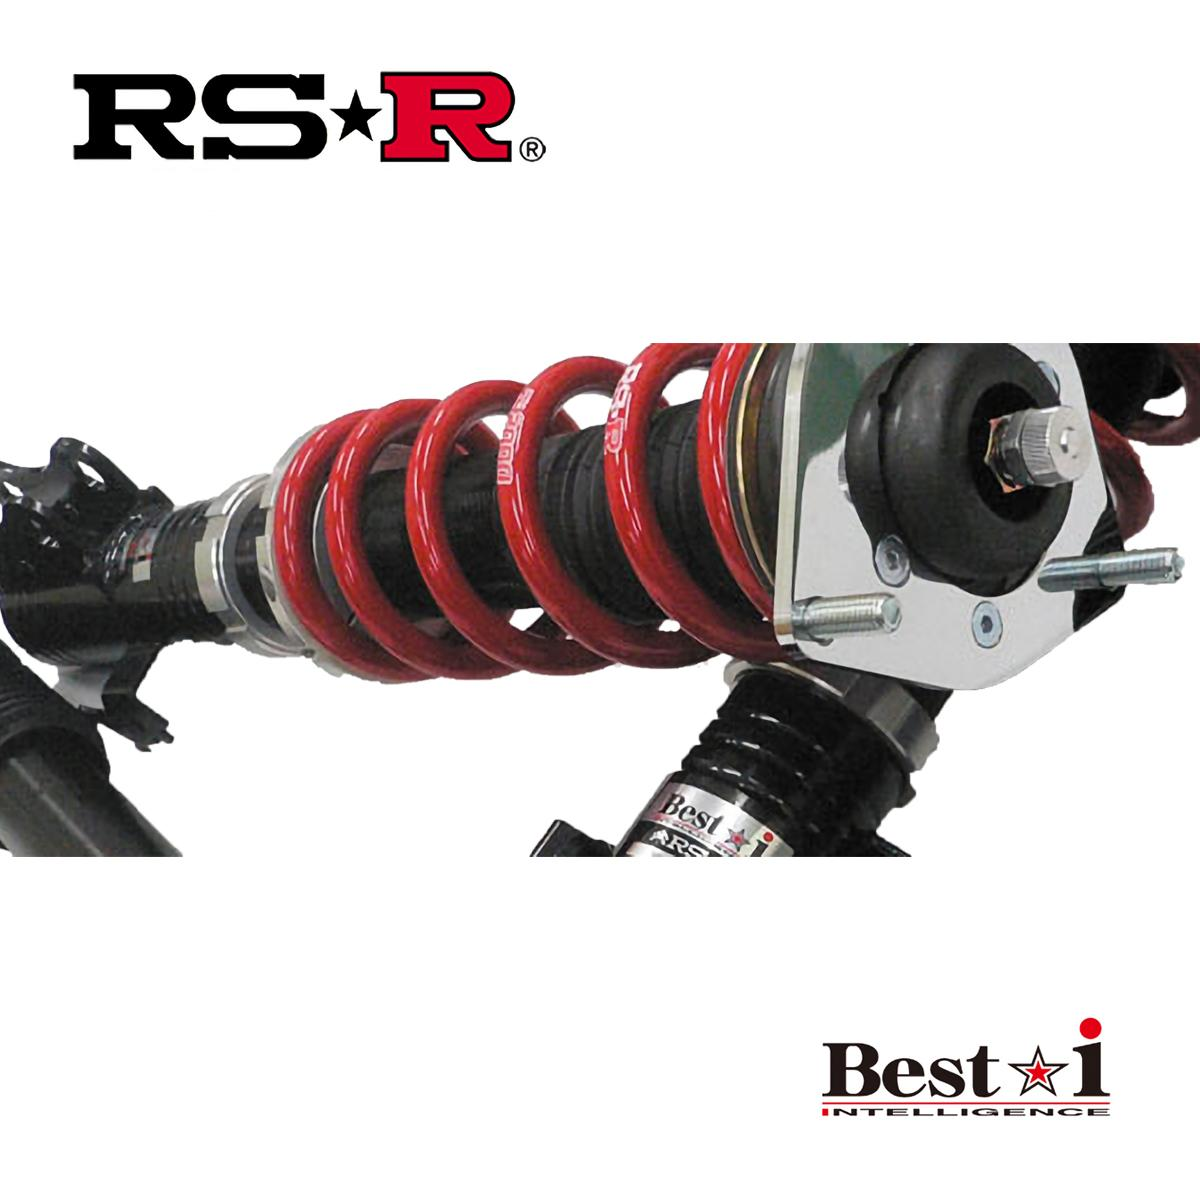 RS-R IS200t Fスポーツ ASE30 車高調 リア車高調整 ネジ式 LIT193M RSR ベストi RSR 個人宅発送追金有